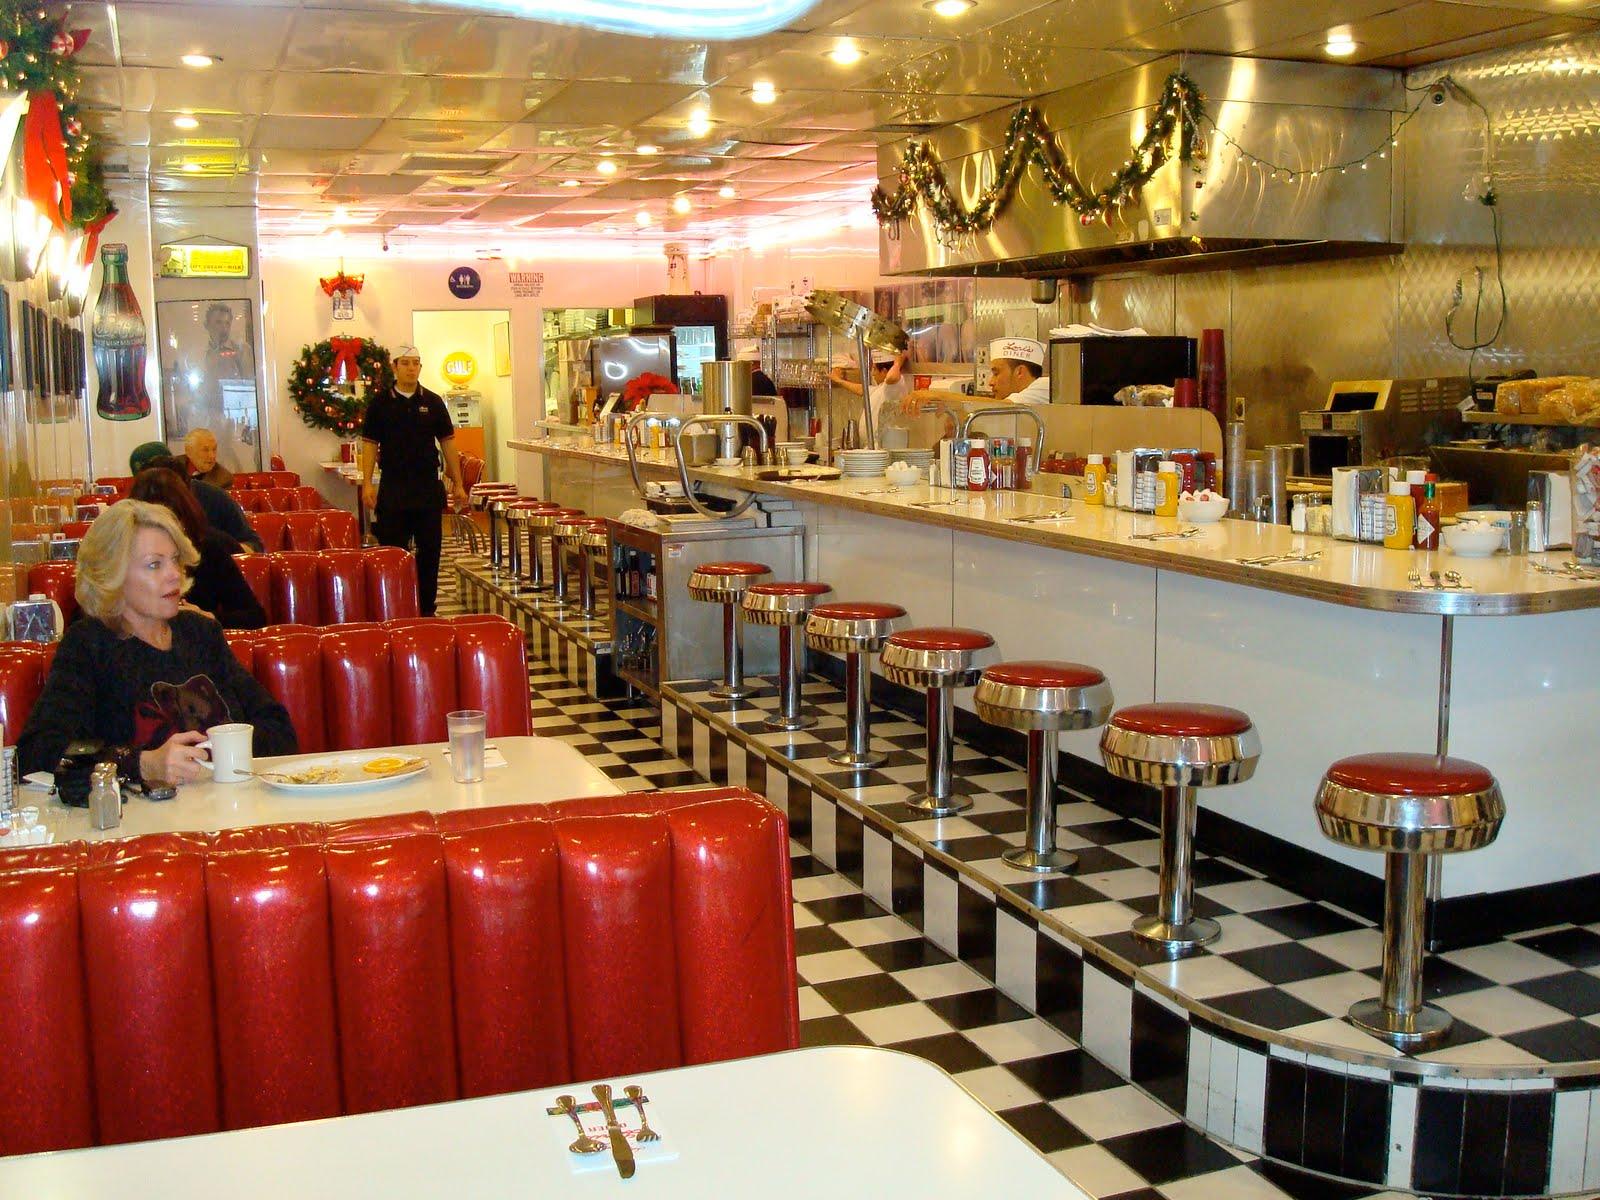 Uncategorized hospitality boys for American bistro cuisine